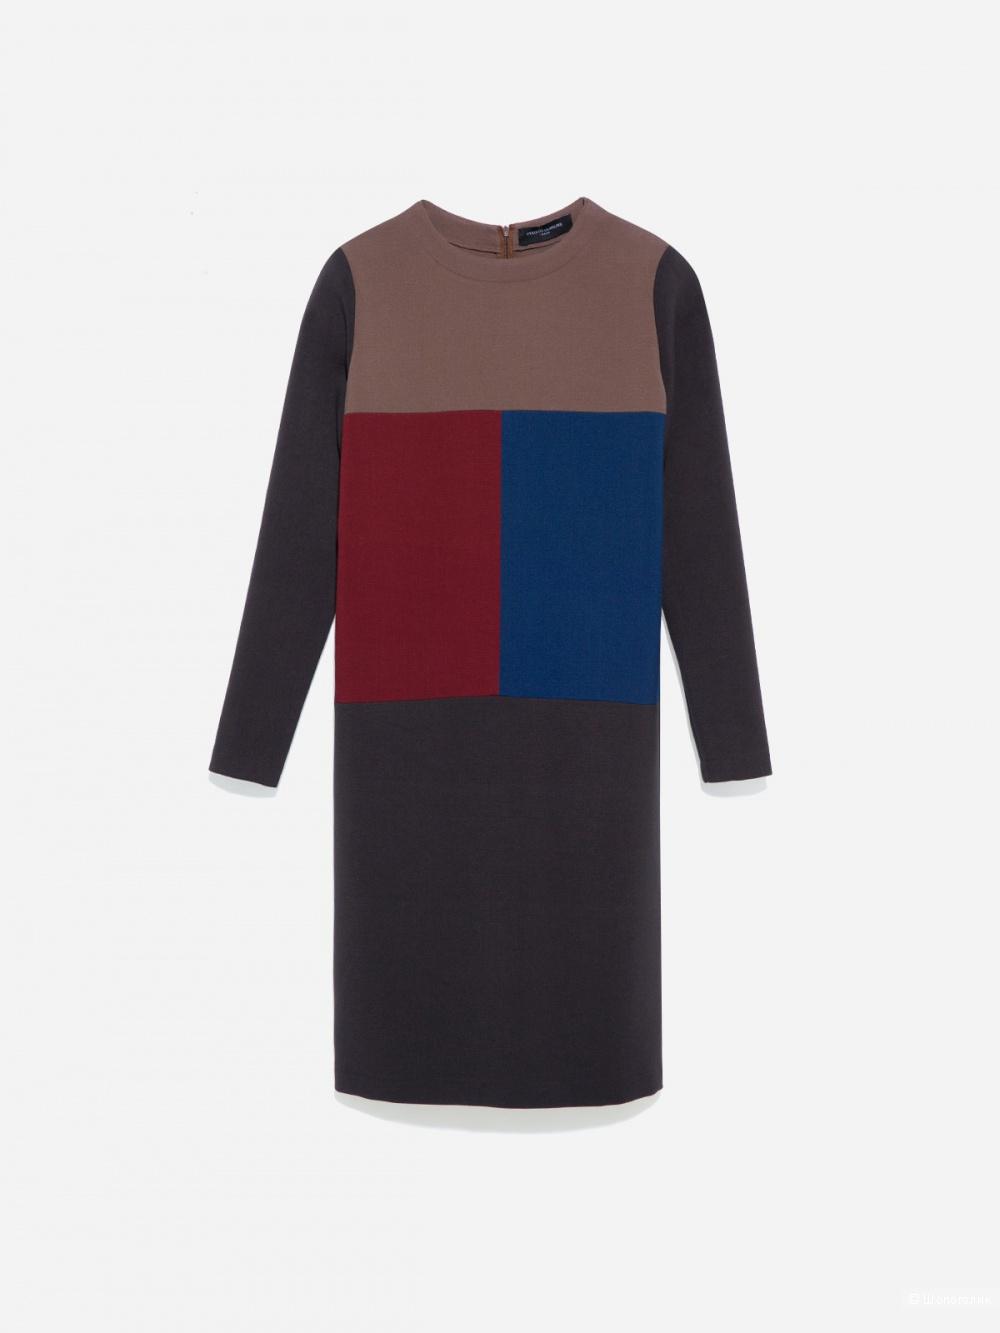 Платье Сyrille Gassiline, размер 44